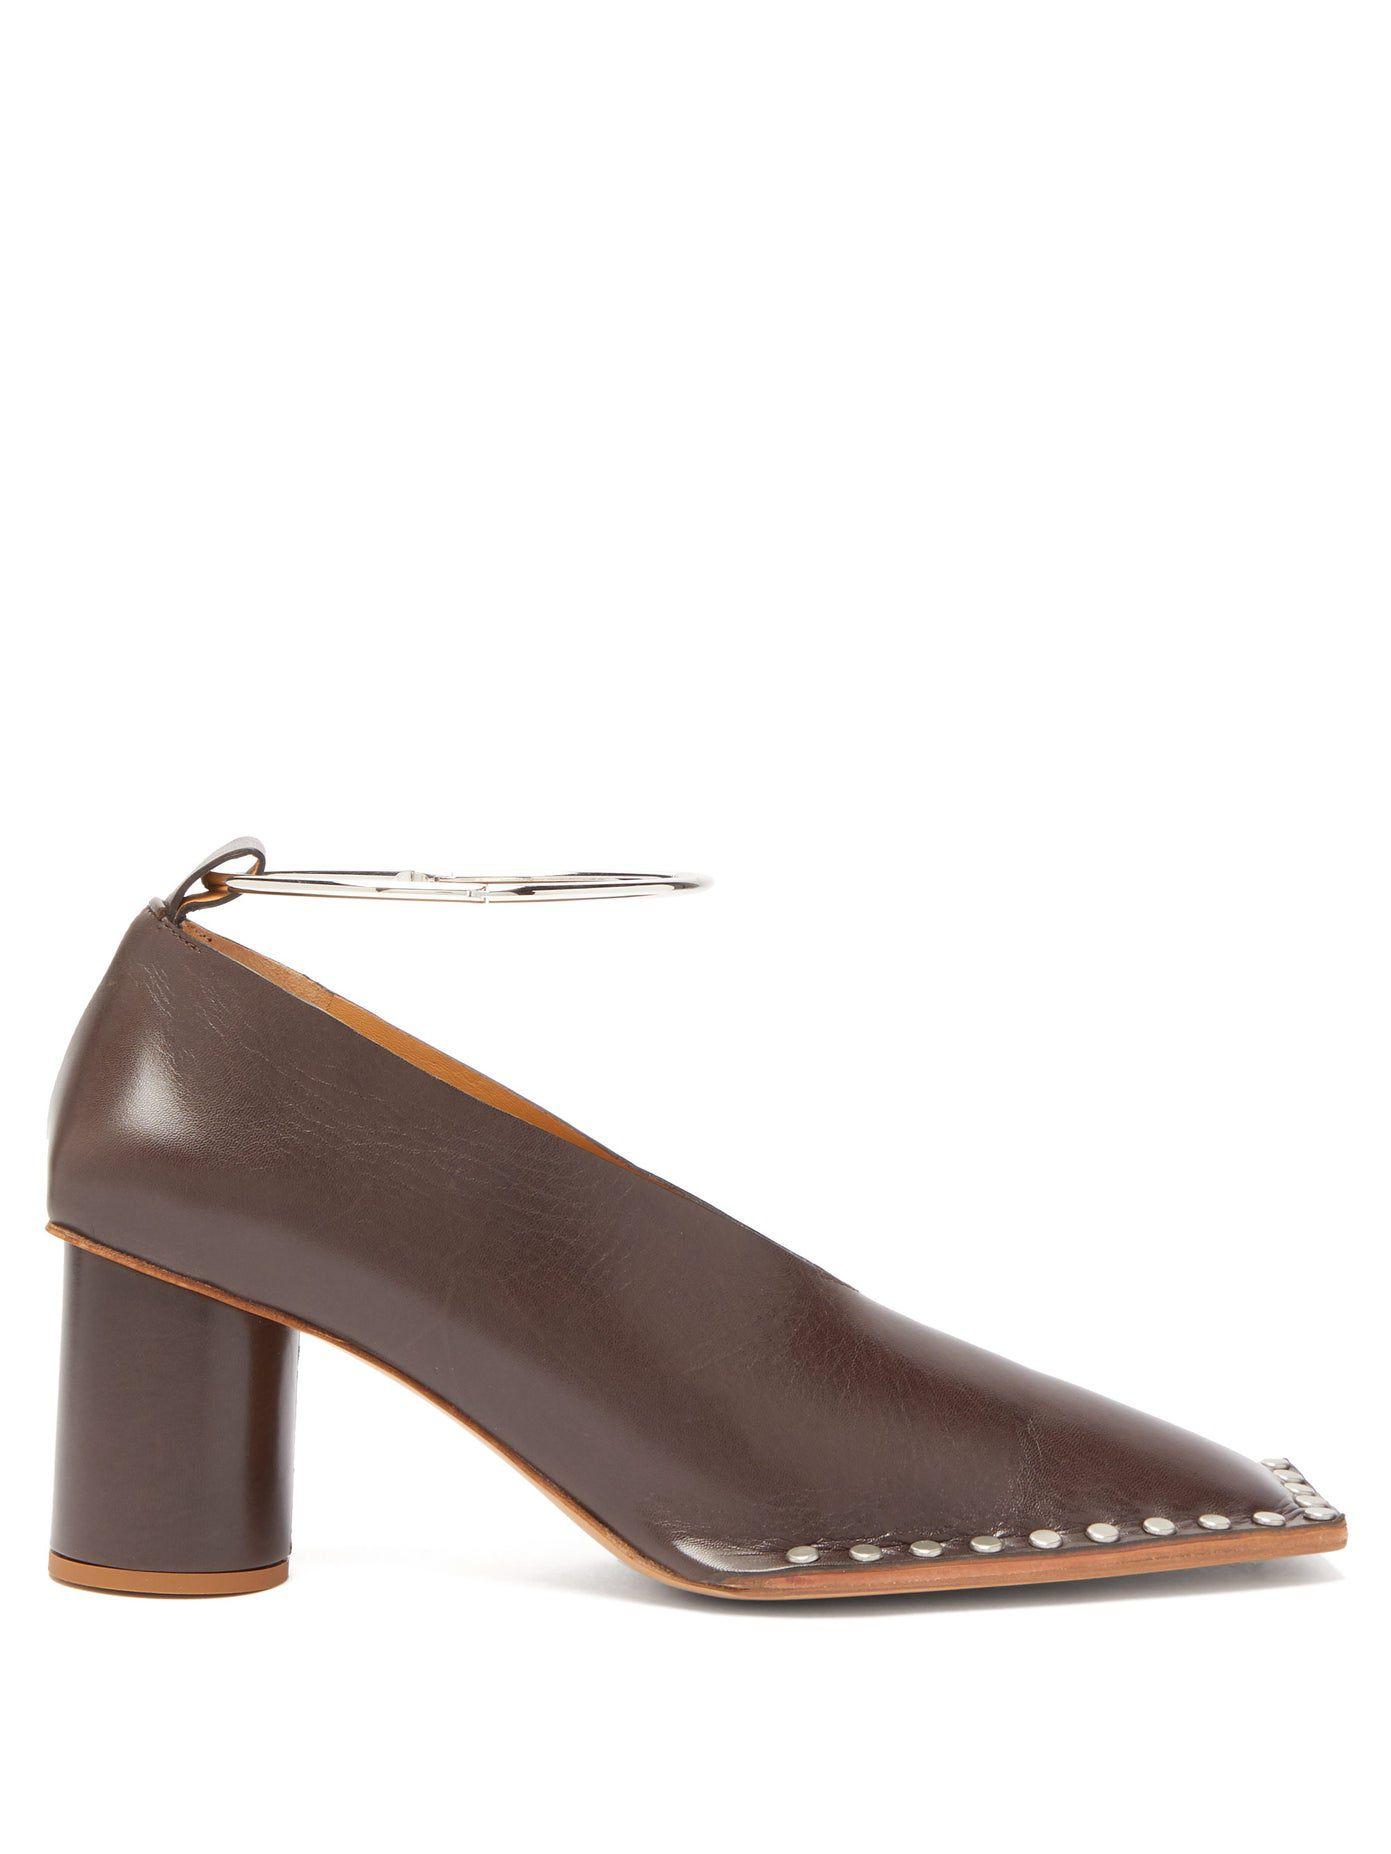 Jil Sander Studded square-toe leather pumps